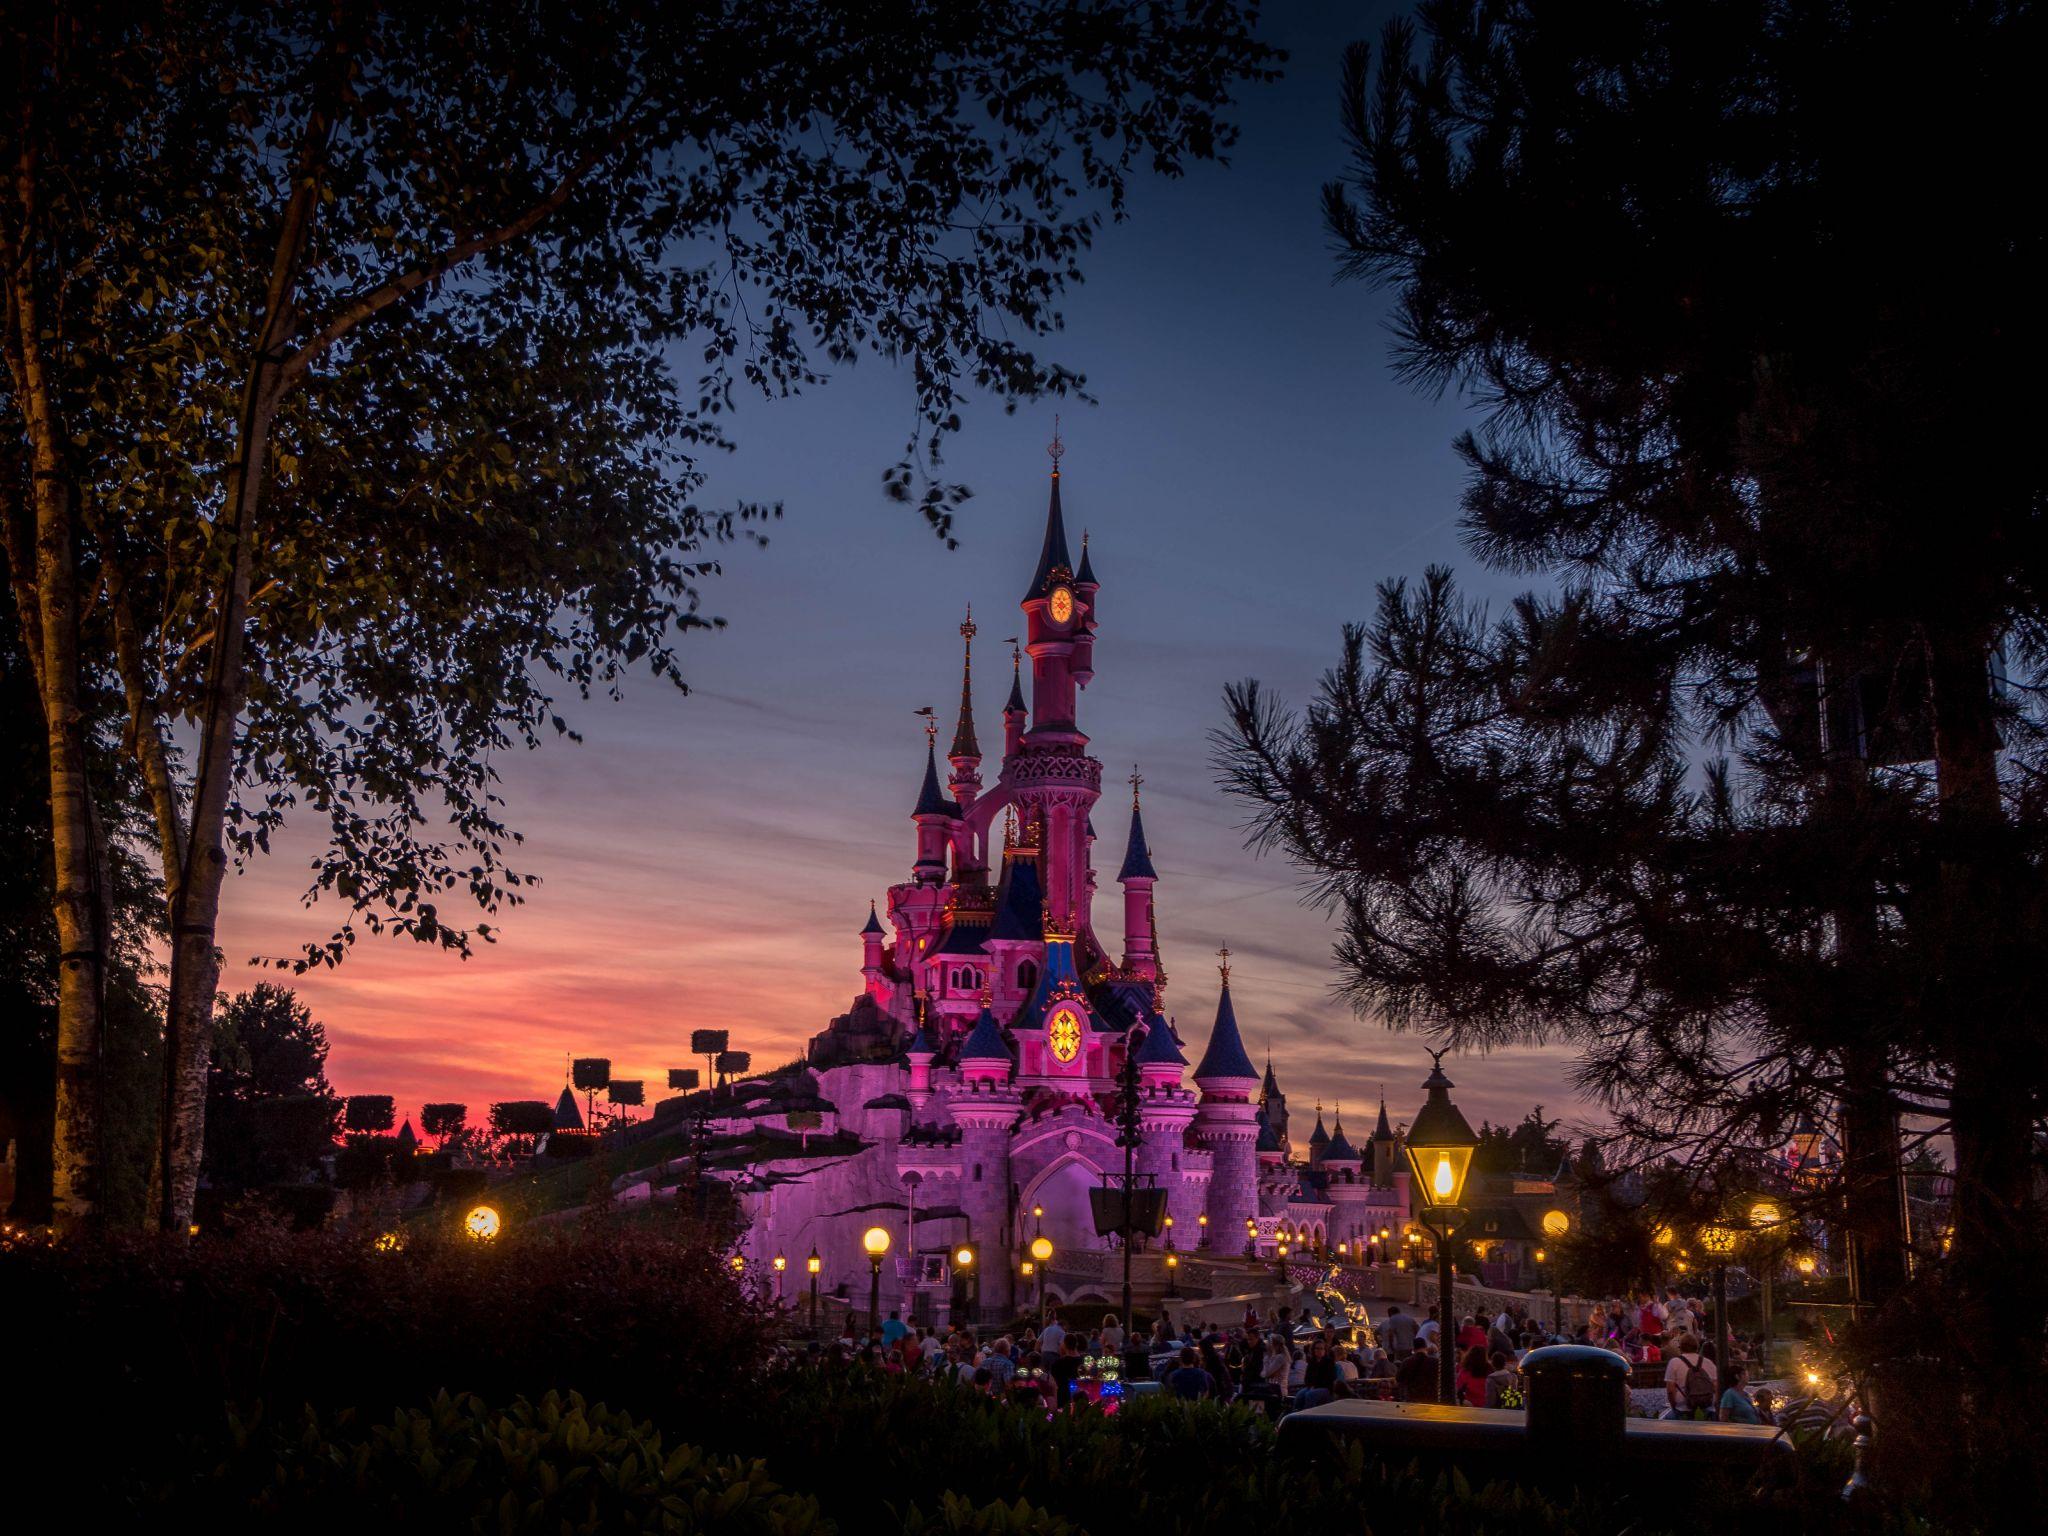 Disneyland Paris - Disney Castle, France